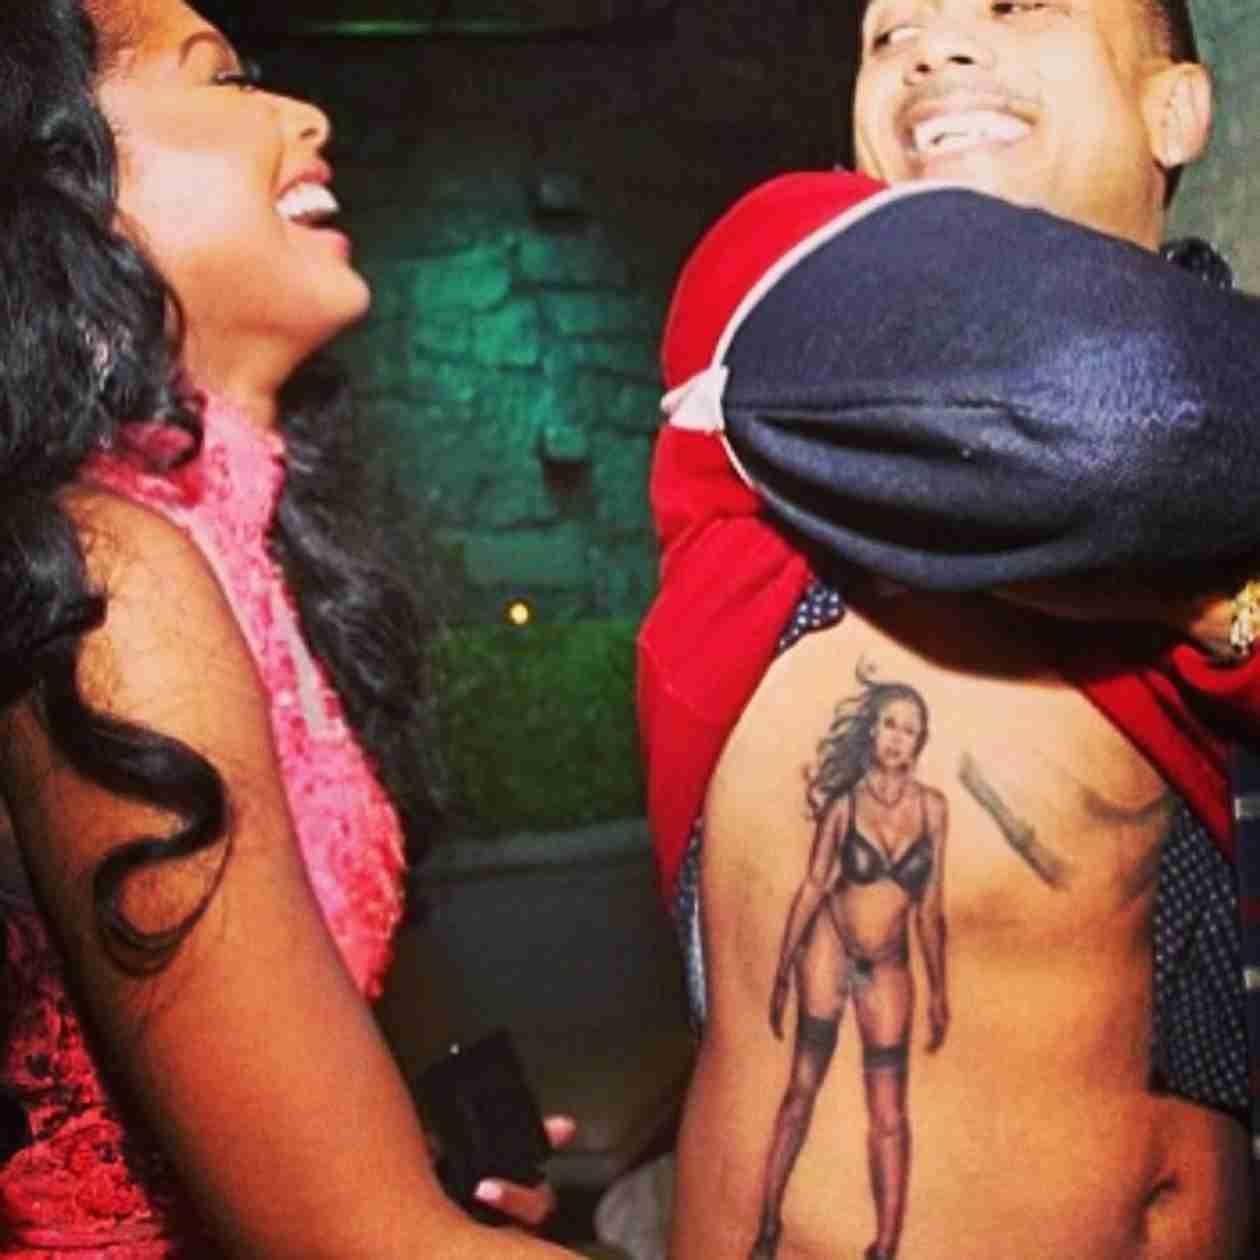 Benzino Tattoos Fiancée's Body Across His Side?! (PHOTOS)